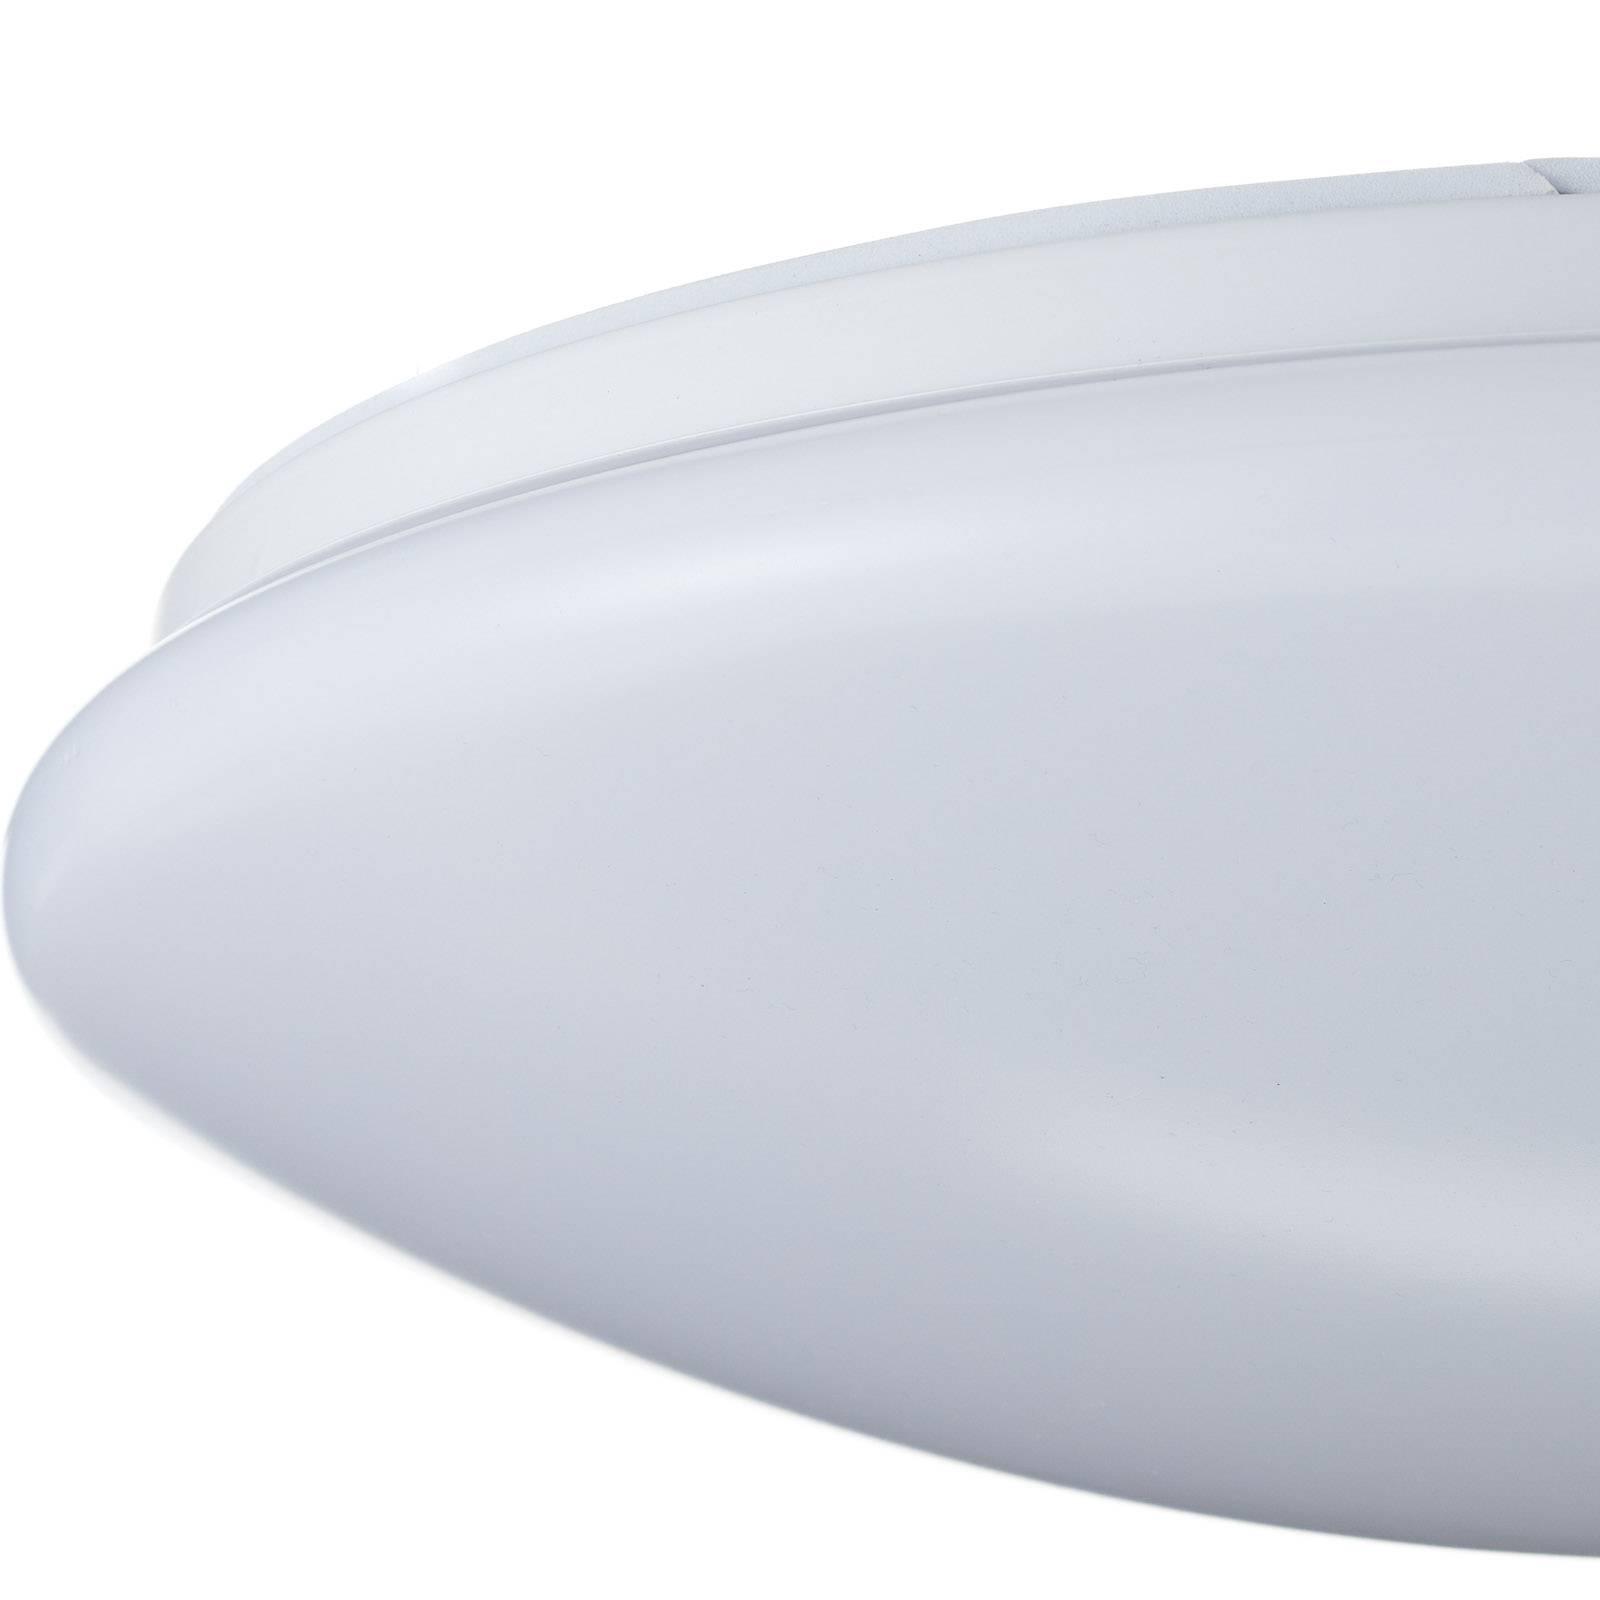 LED plafondlamp Altona, Ø 38,5cm 1.950lm 4.000K